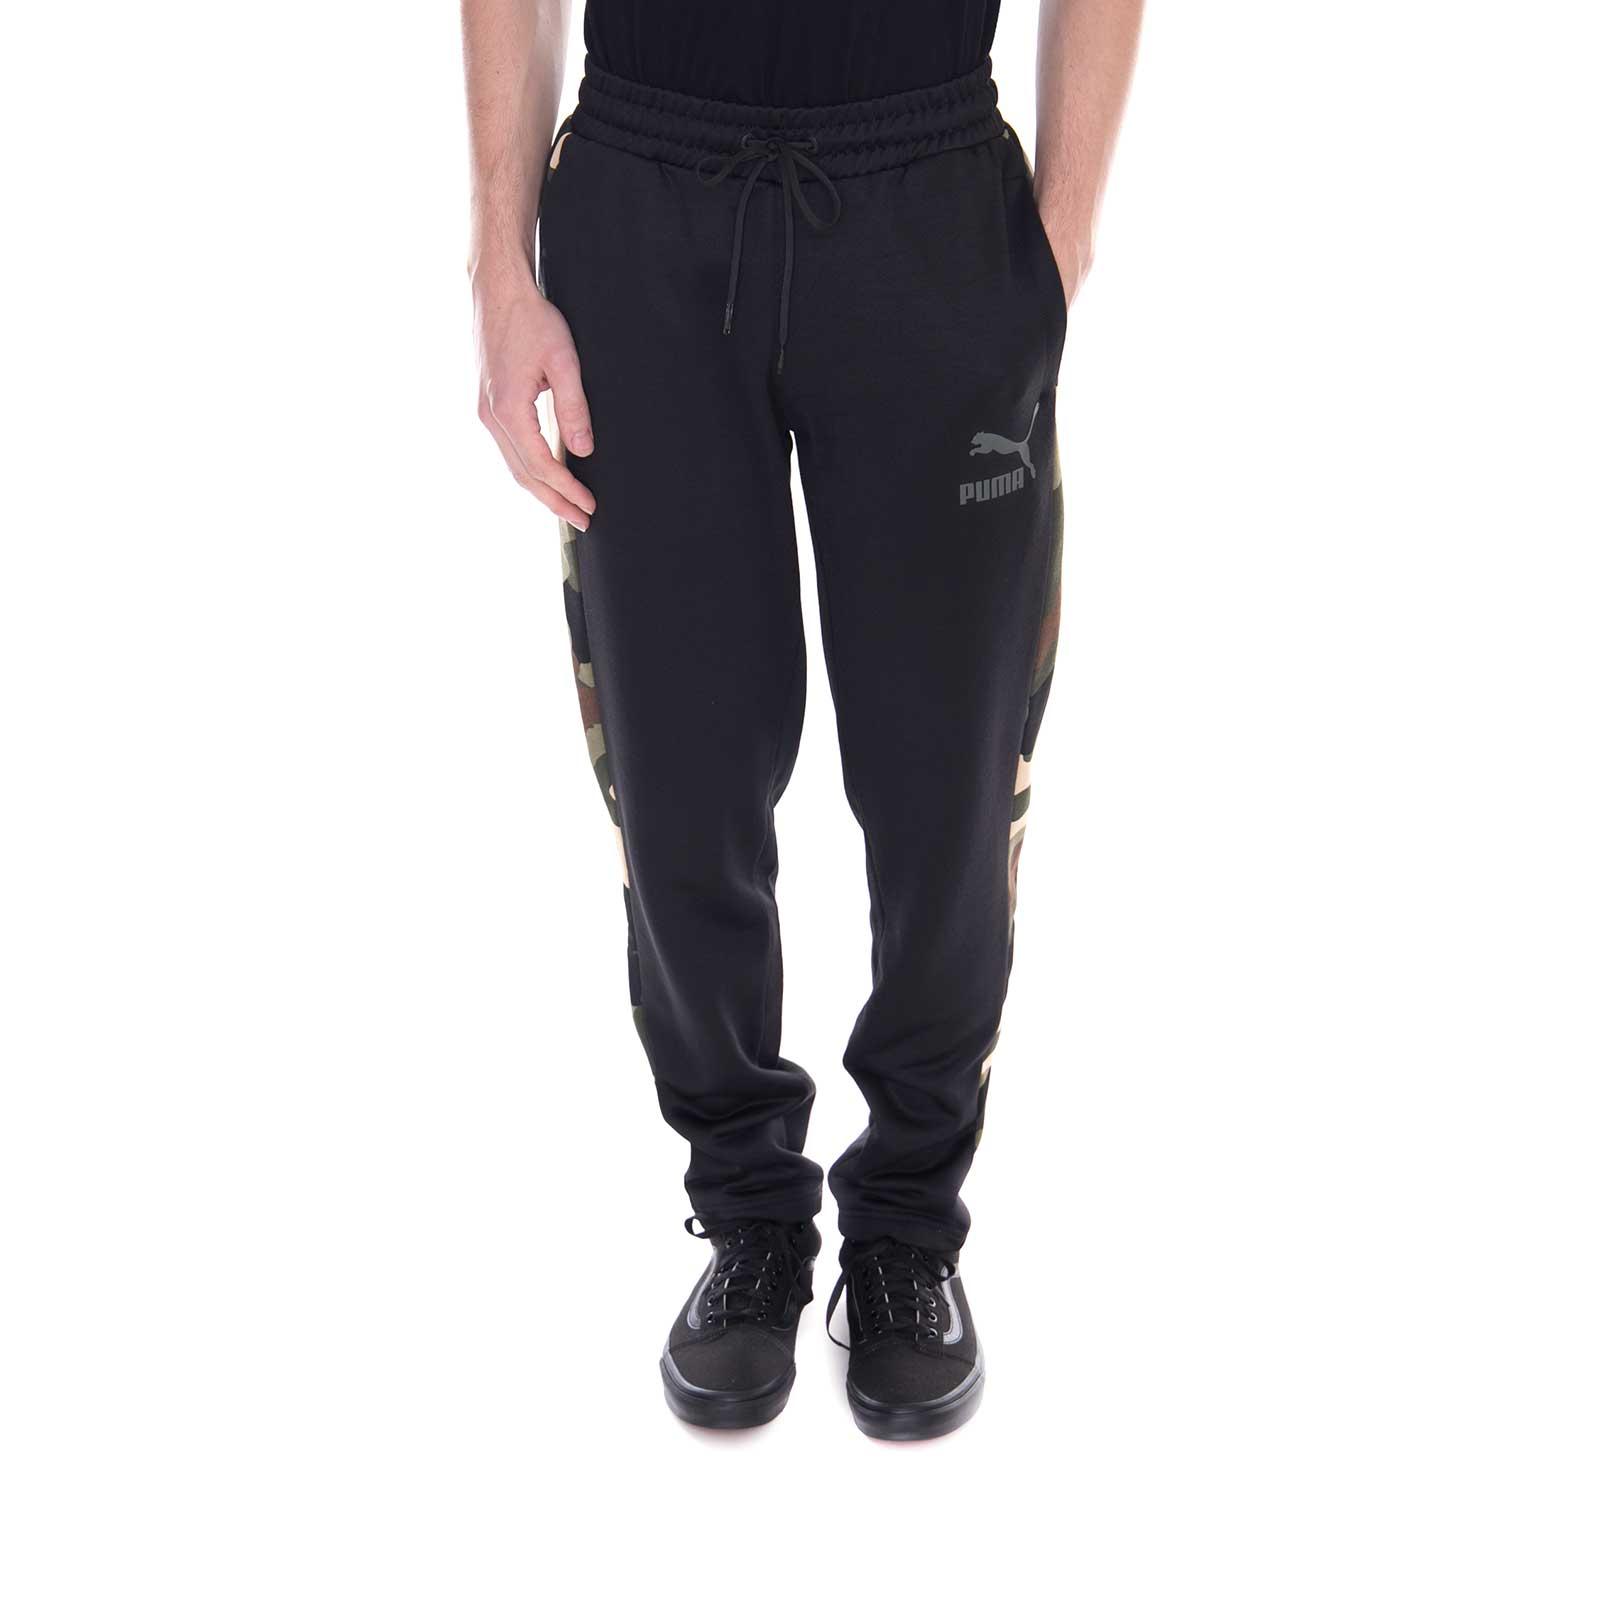 Pantaloni Puma Uomo | Ferrari T7 Track Pants Puma Black